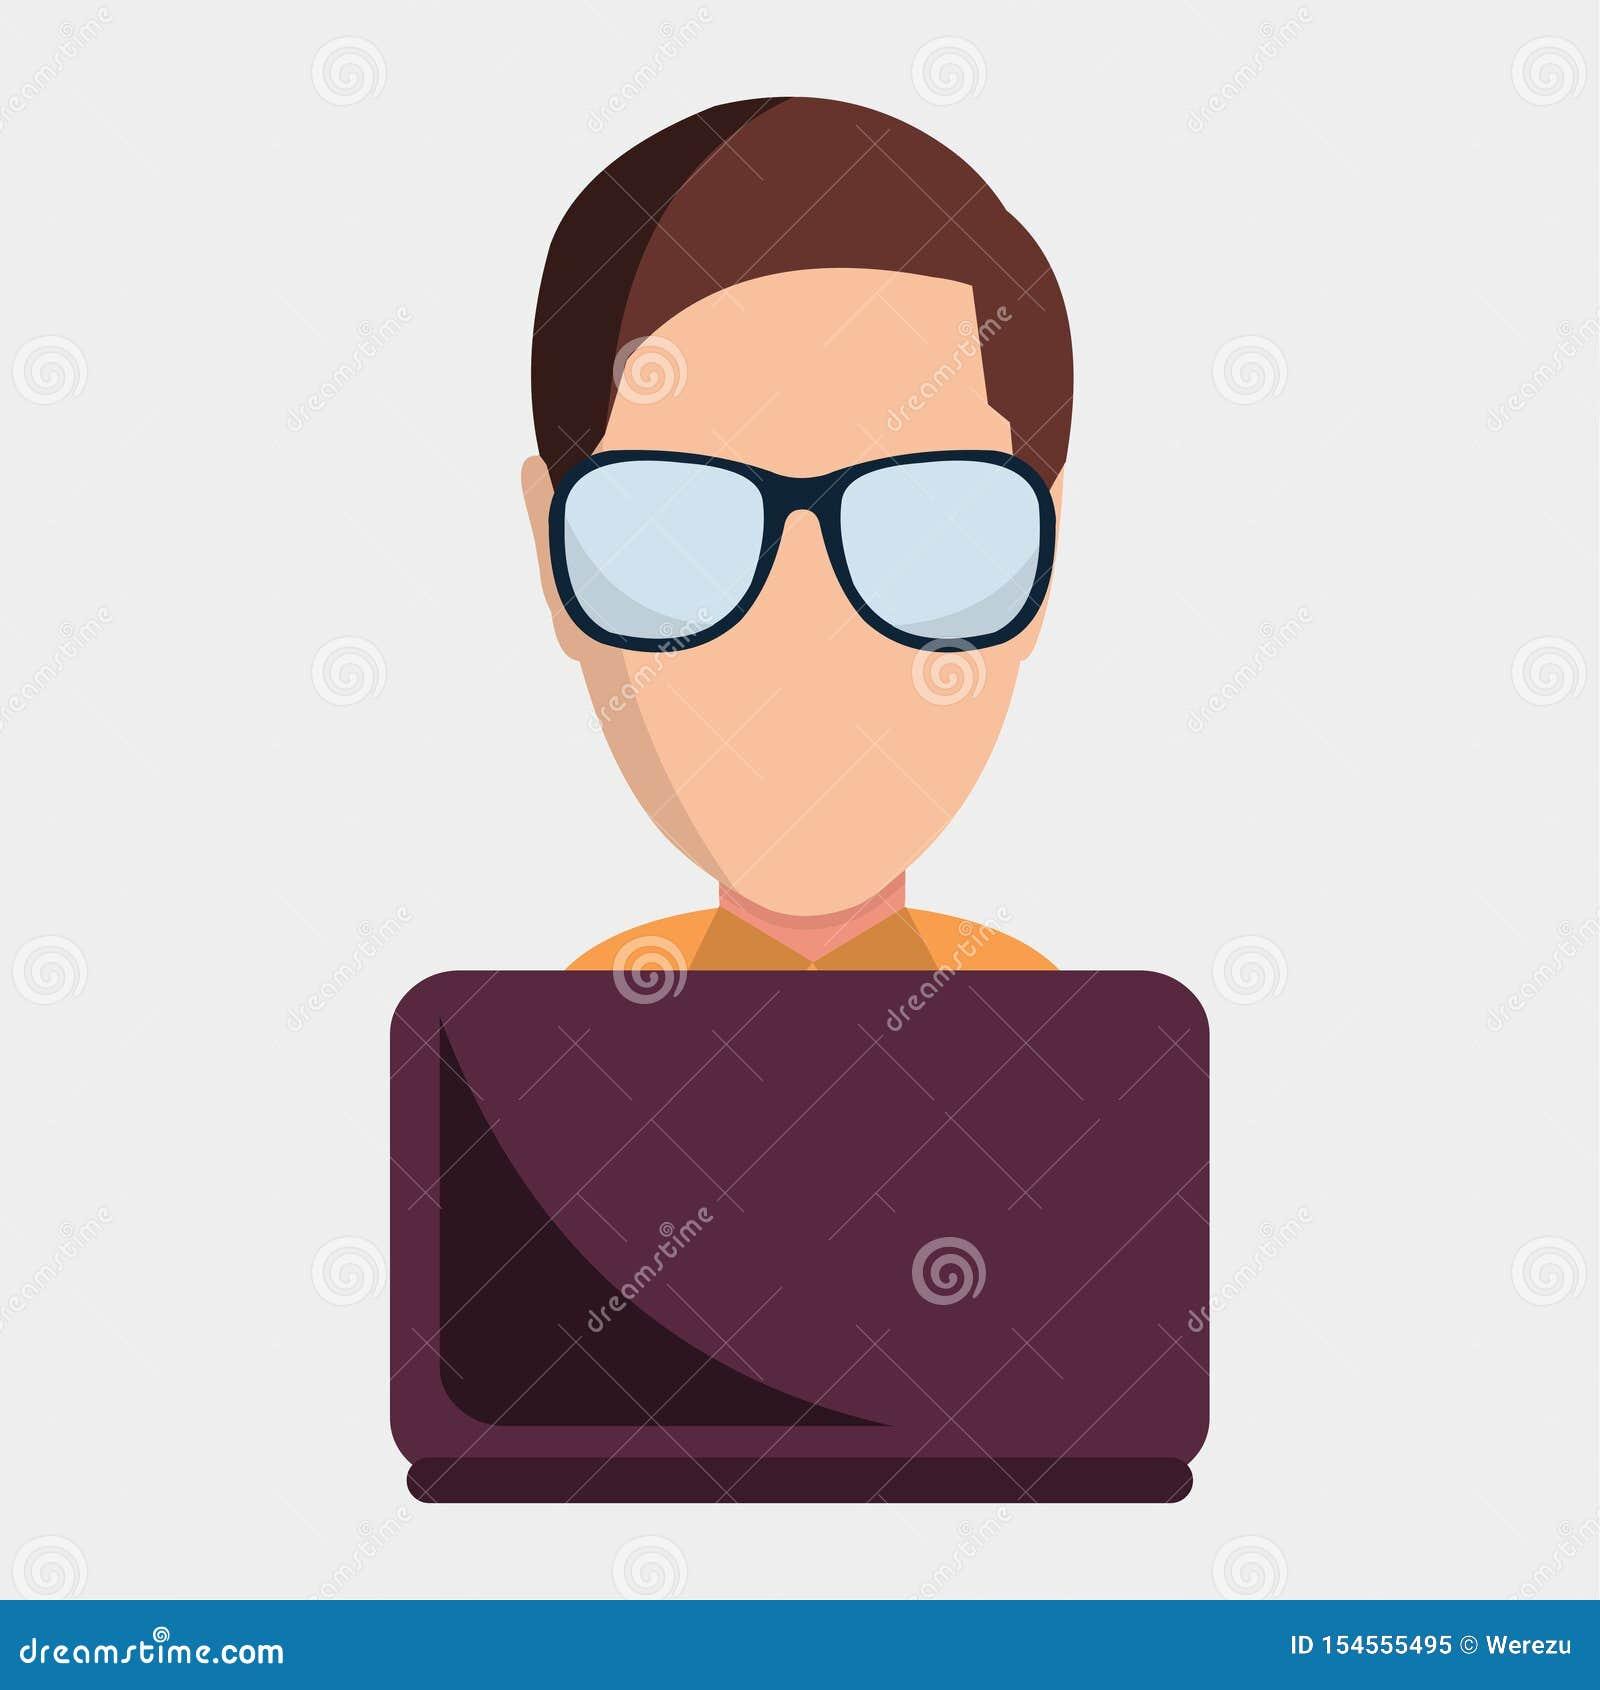 Cheerful Computer Geek - Juggling Gadgets — Stock Vector